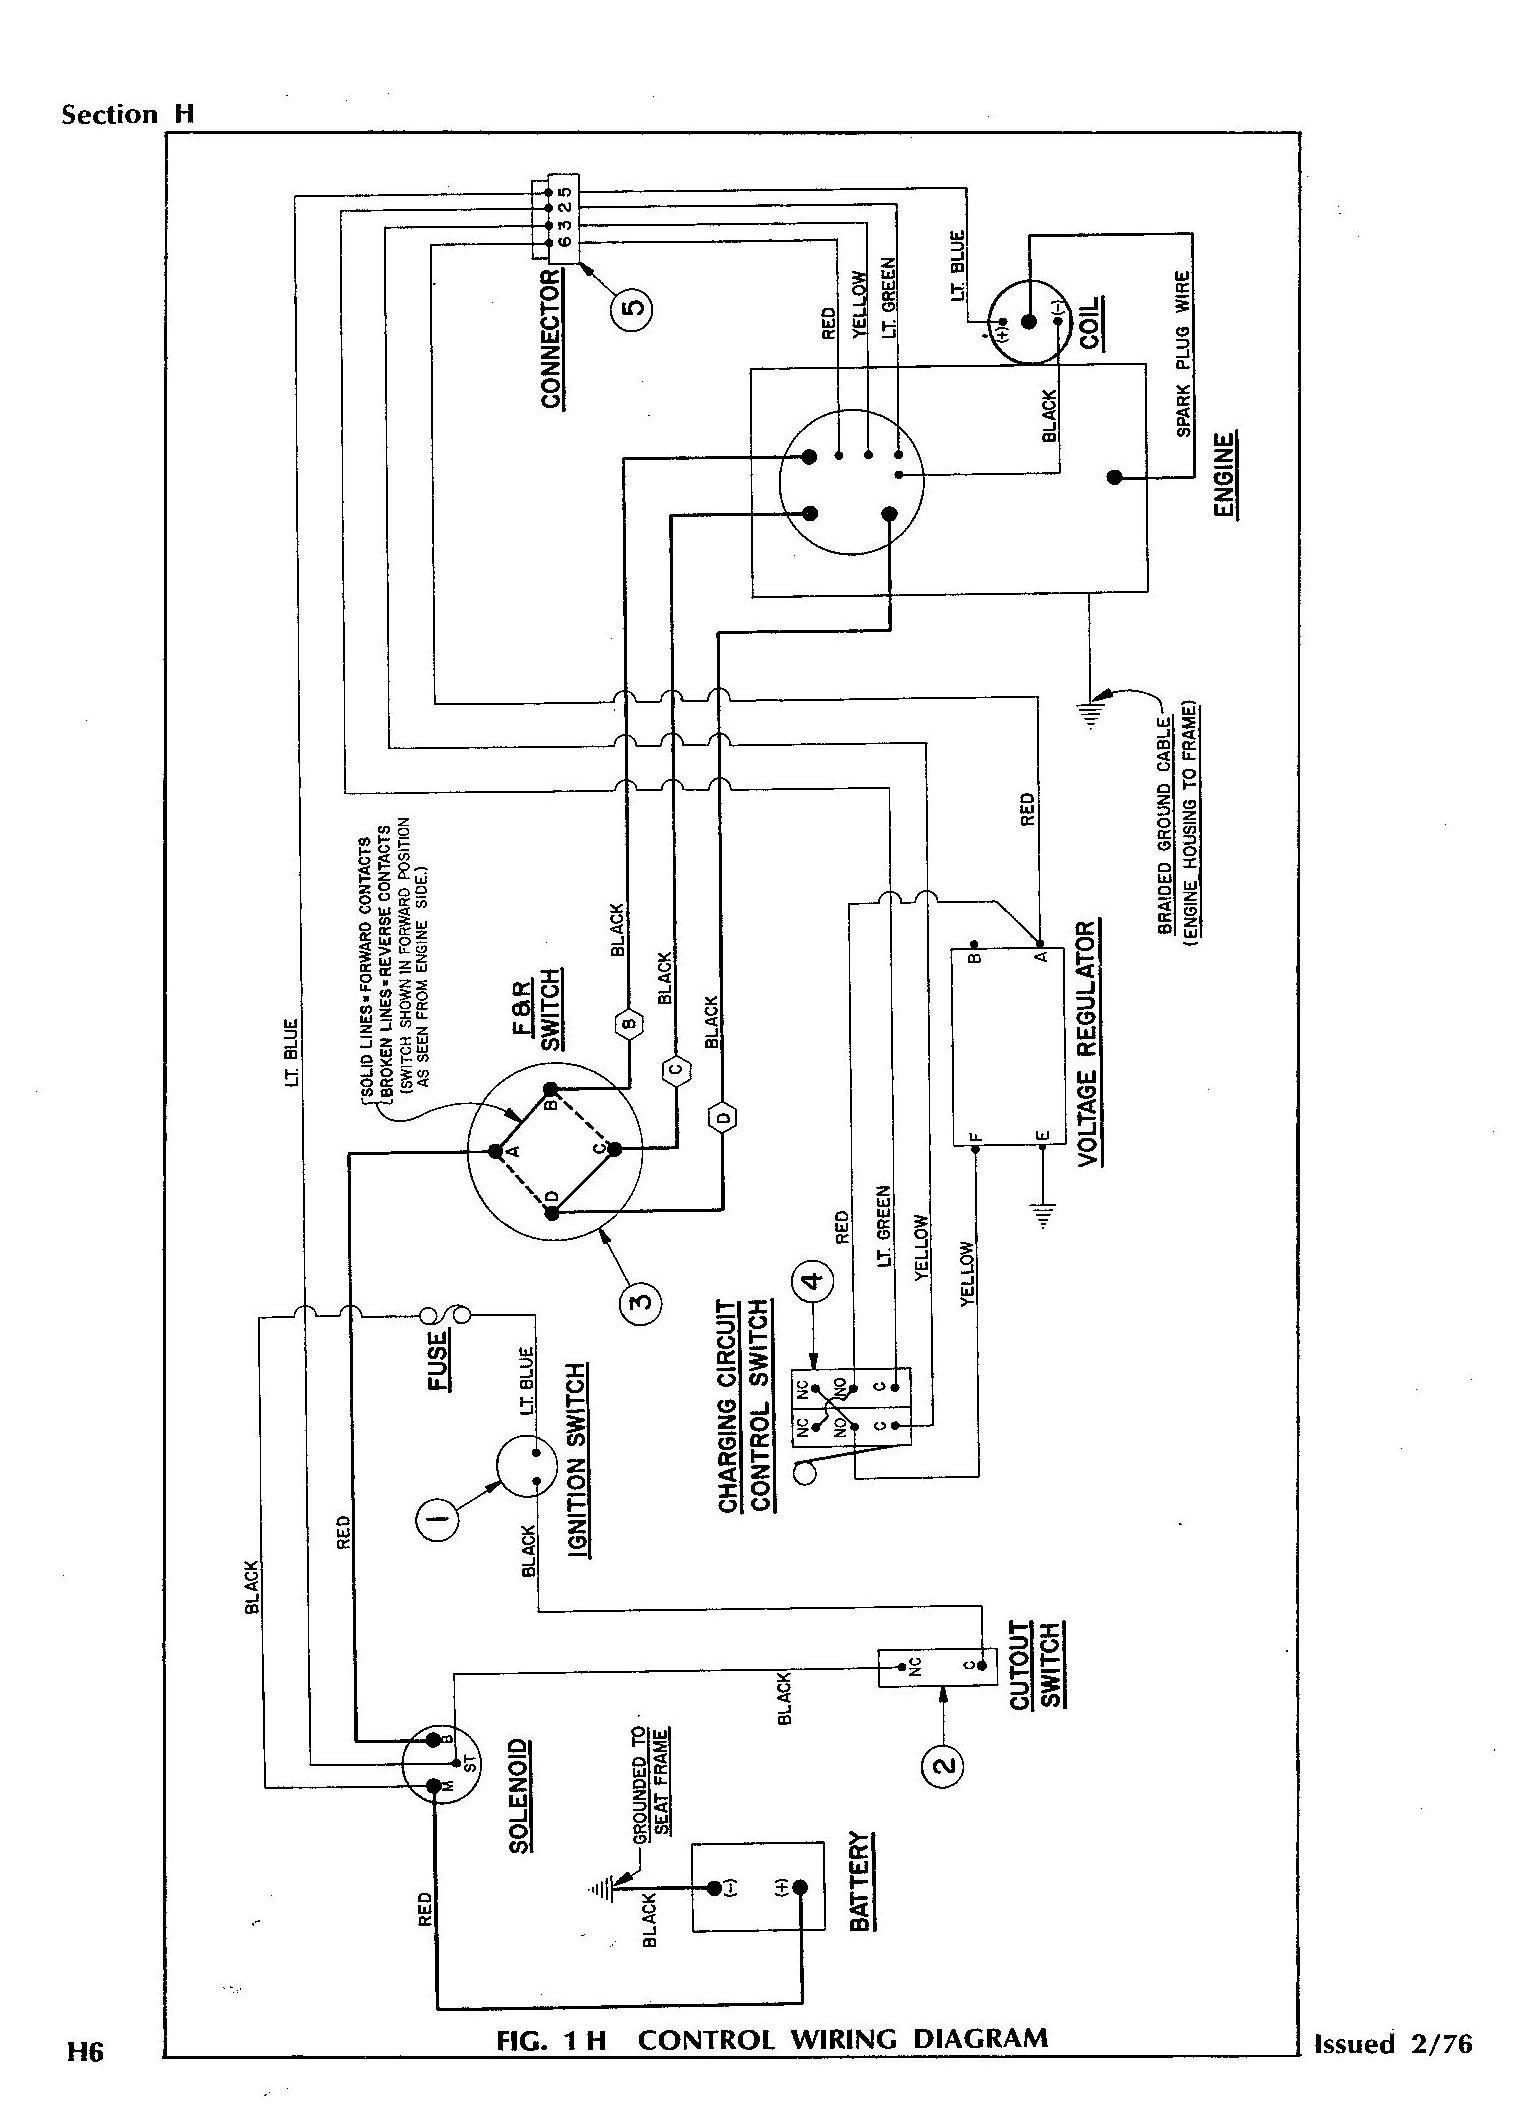 Yamaha Electric Golf Cart Wiring G27e - Wiring Diagram M10 on